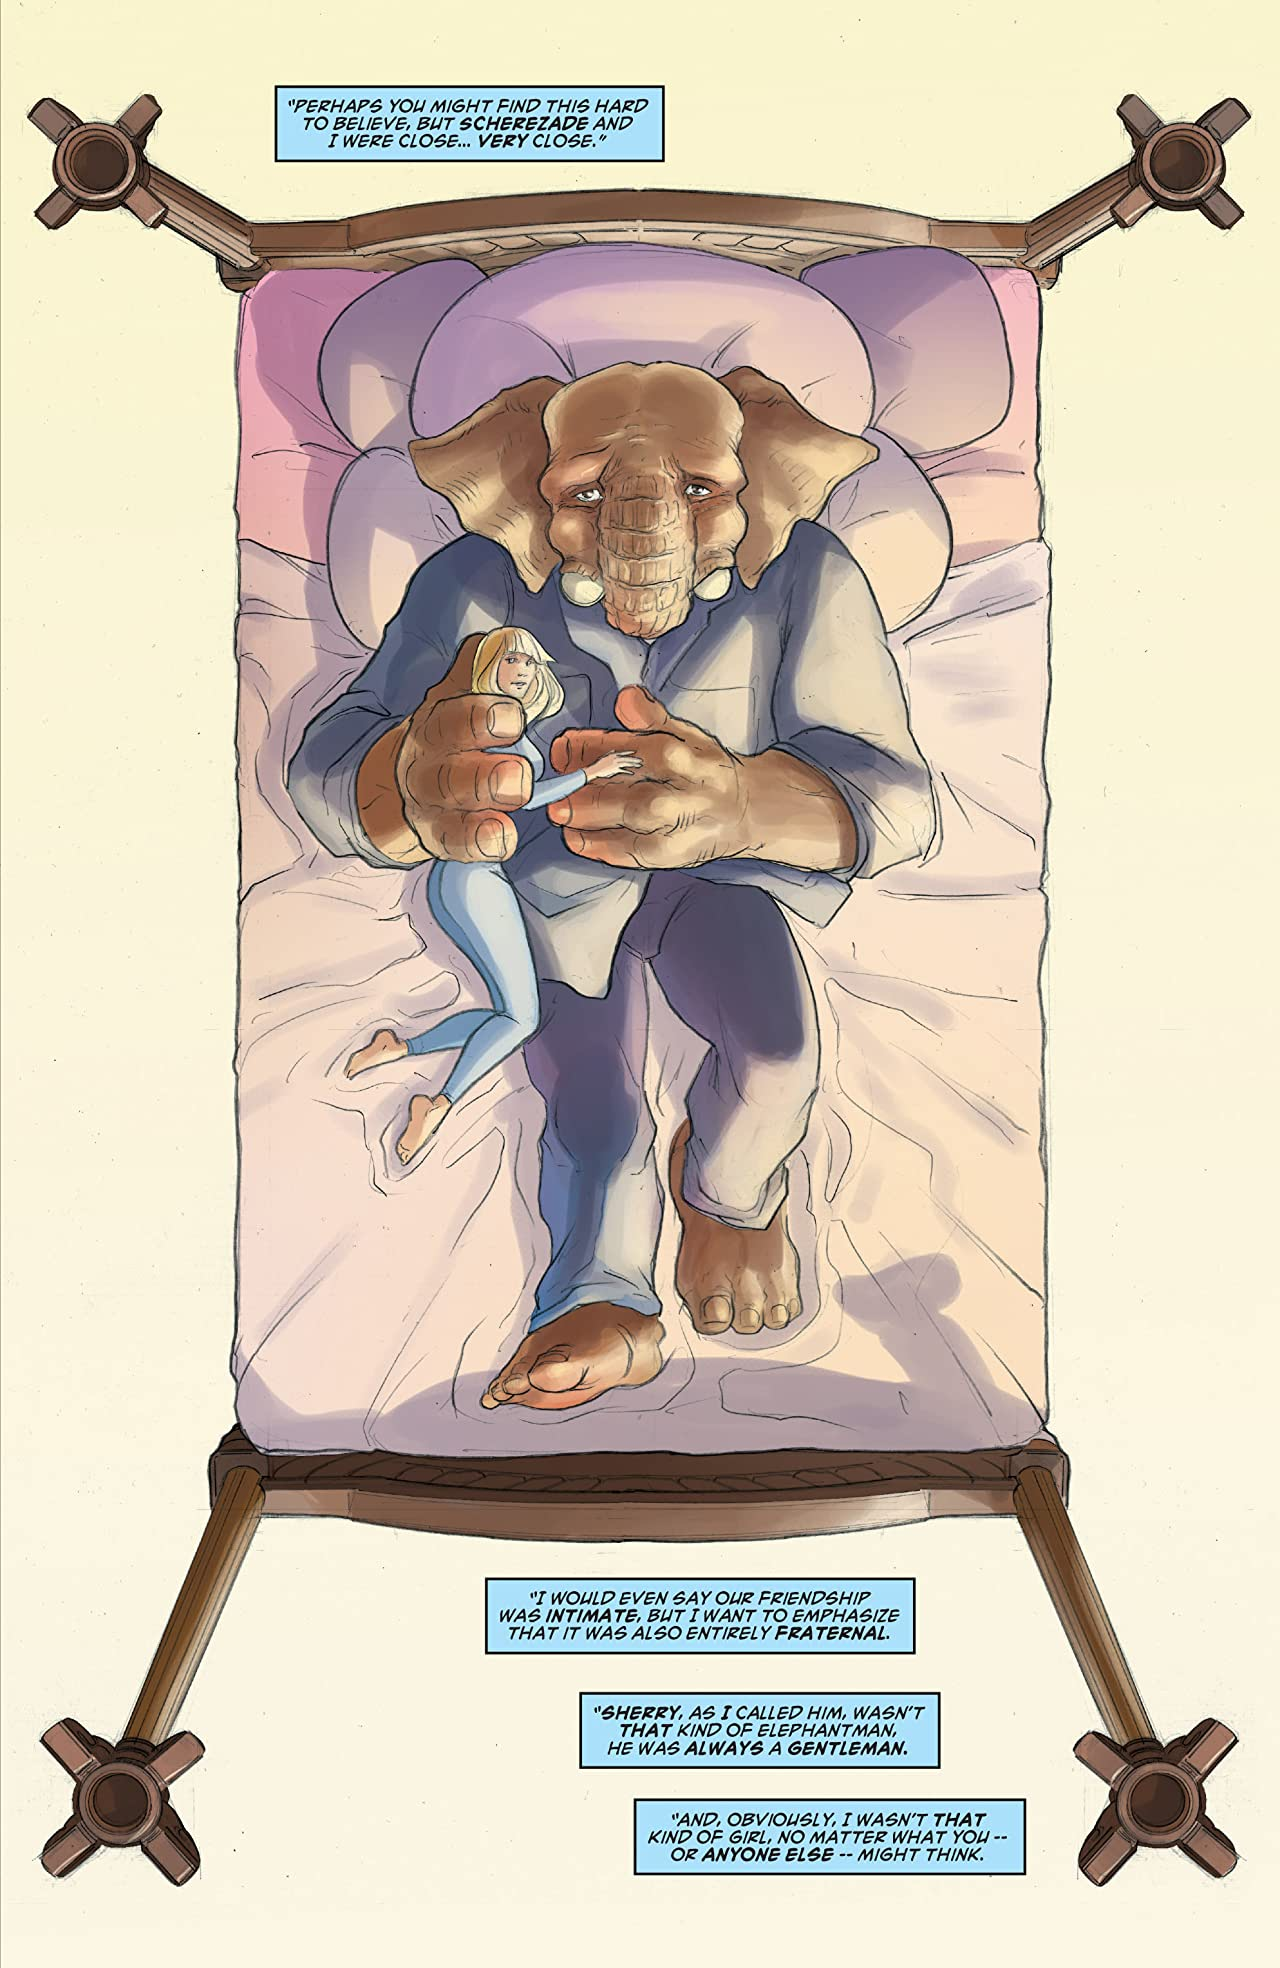 Elephantmen 2261: The Death of Shorty (comiXology Originals) No.3 (sur 5)